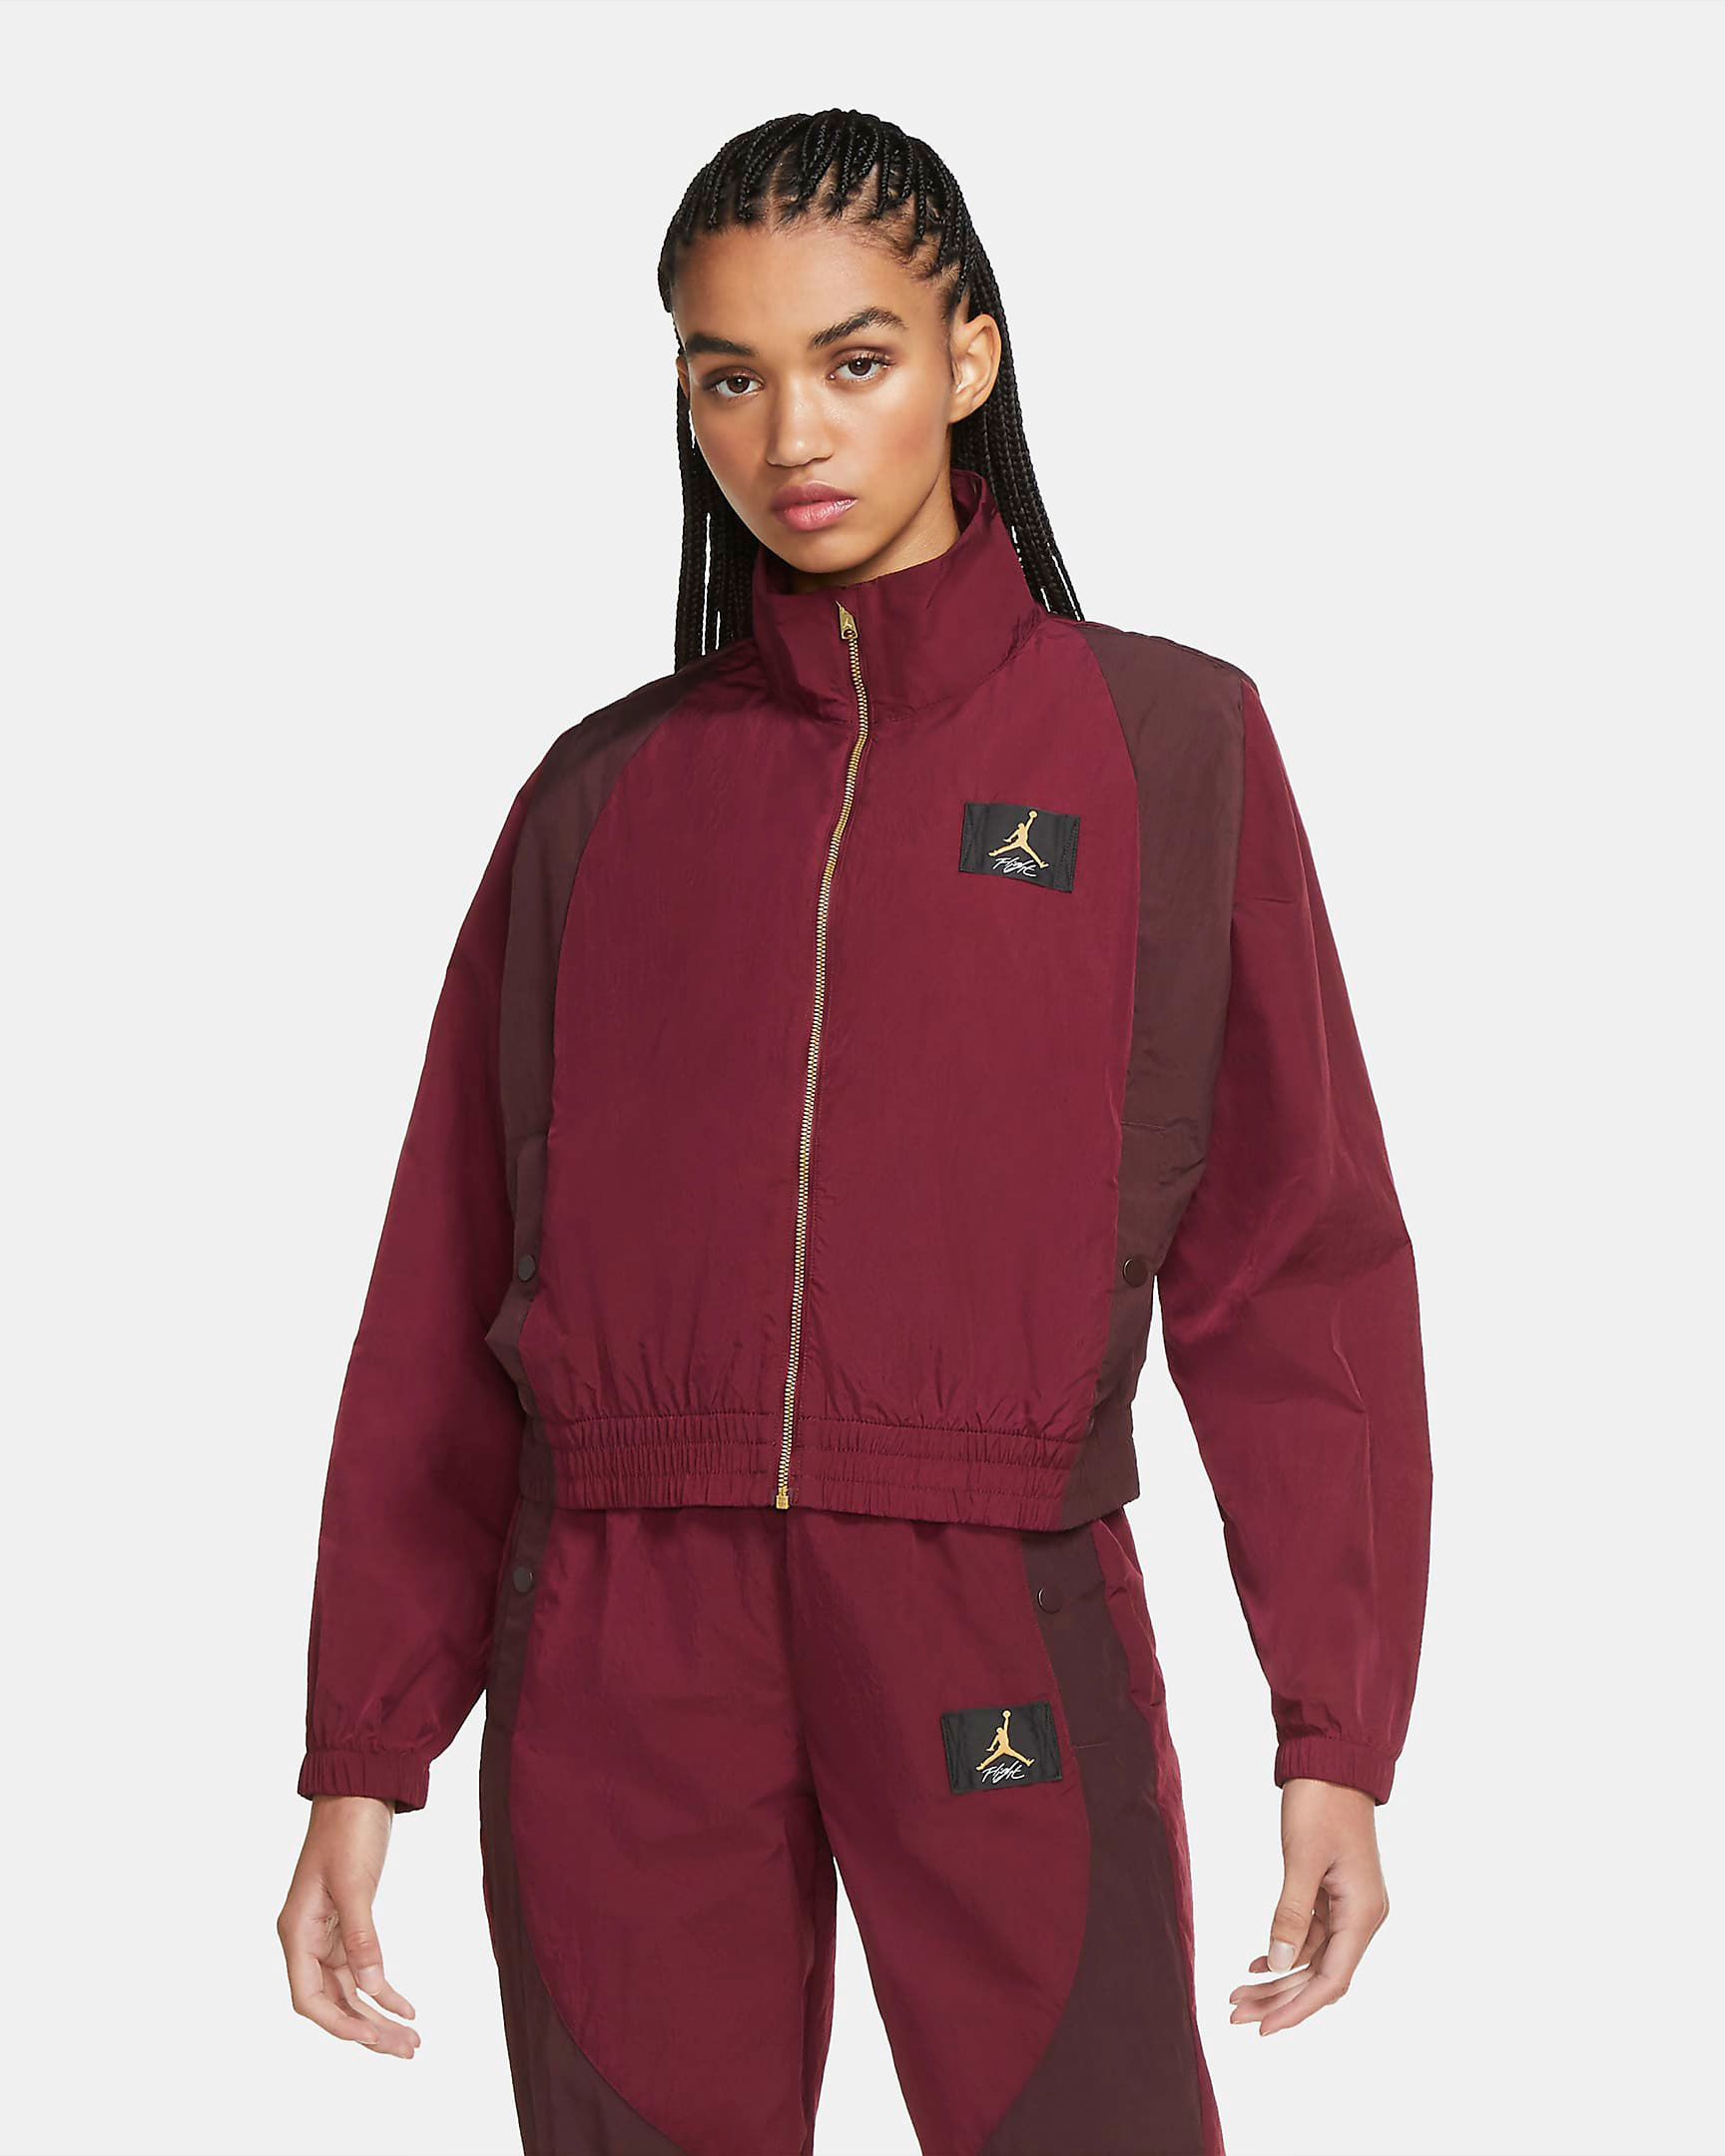 air-jordan-8-burgundy-beetroot-womens-jordan-jacket